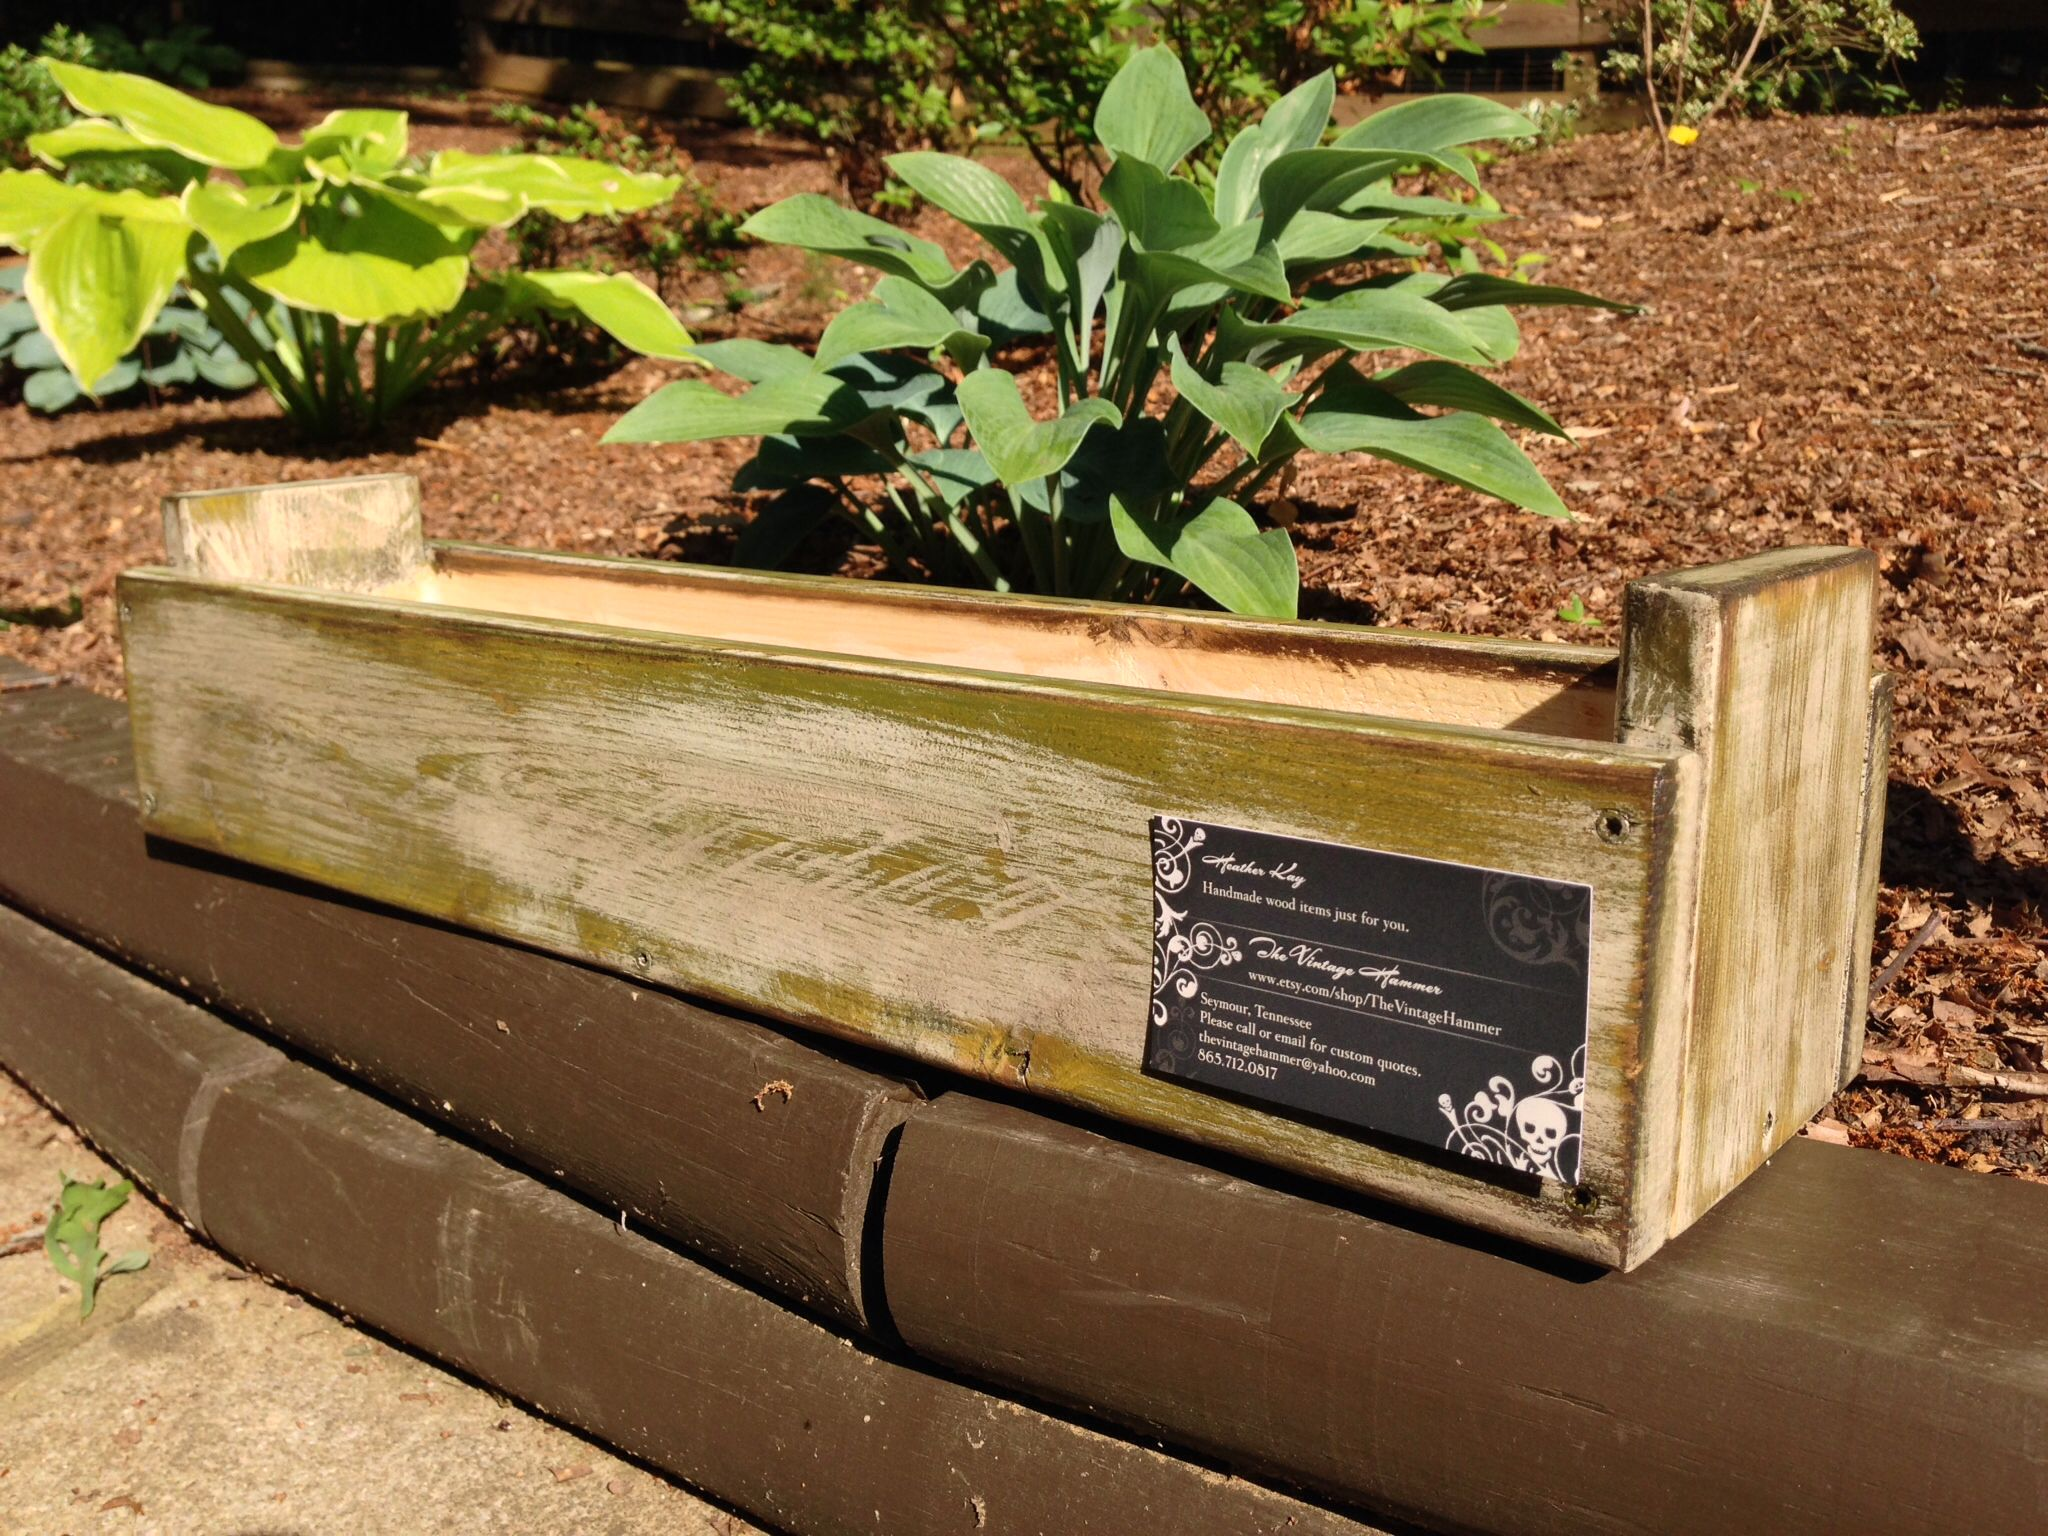 Succulent box in Okra Green. | The Vintage Hammer | Pinterest | Okra ...